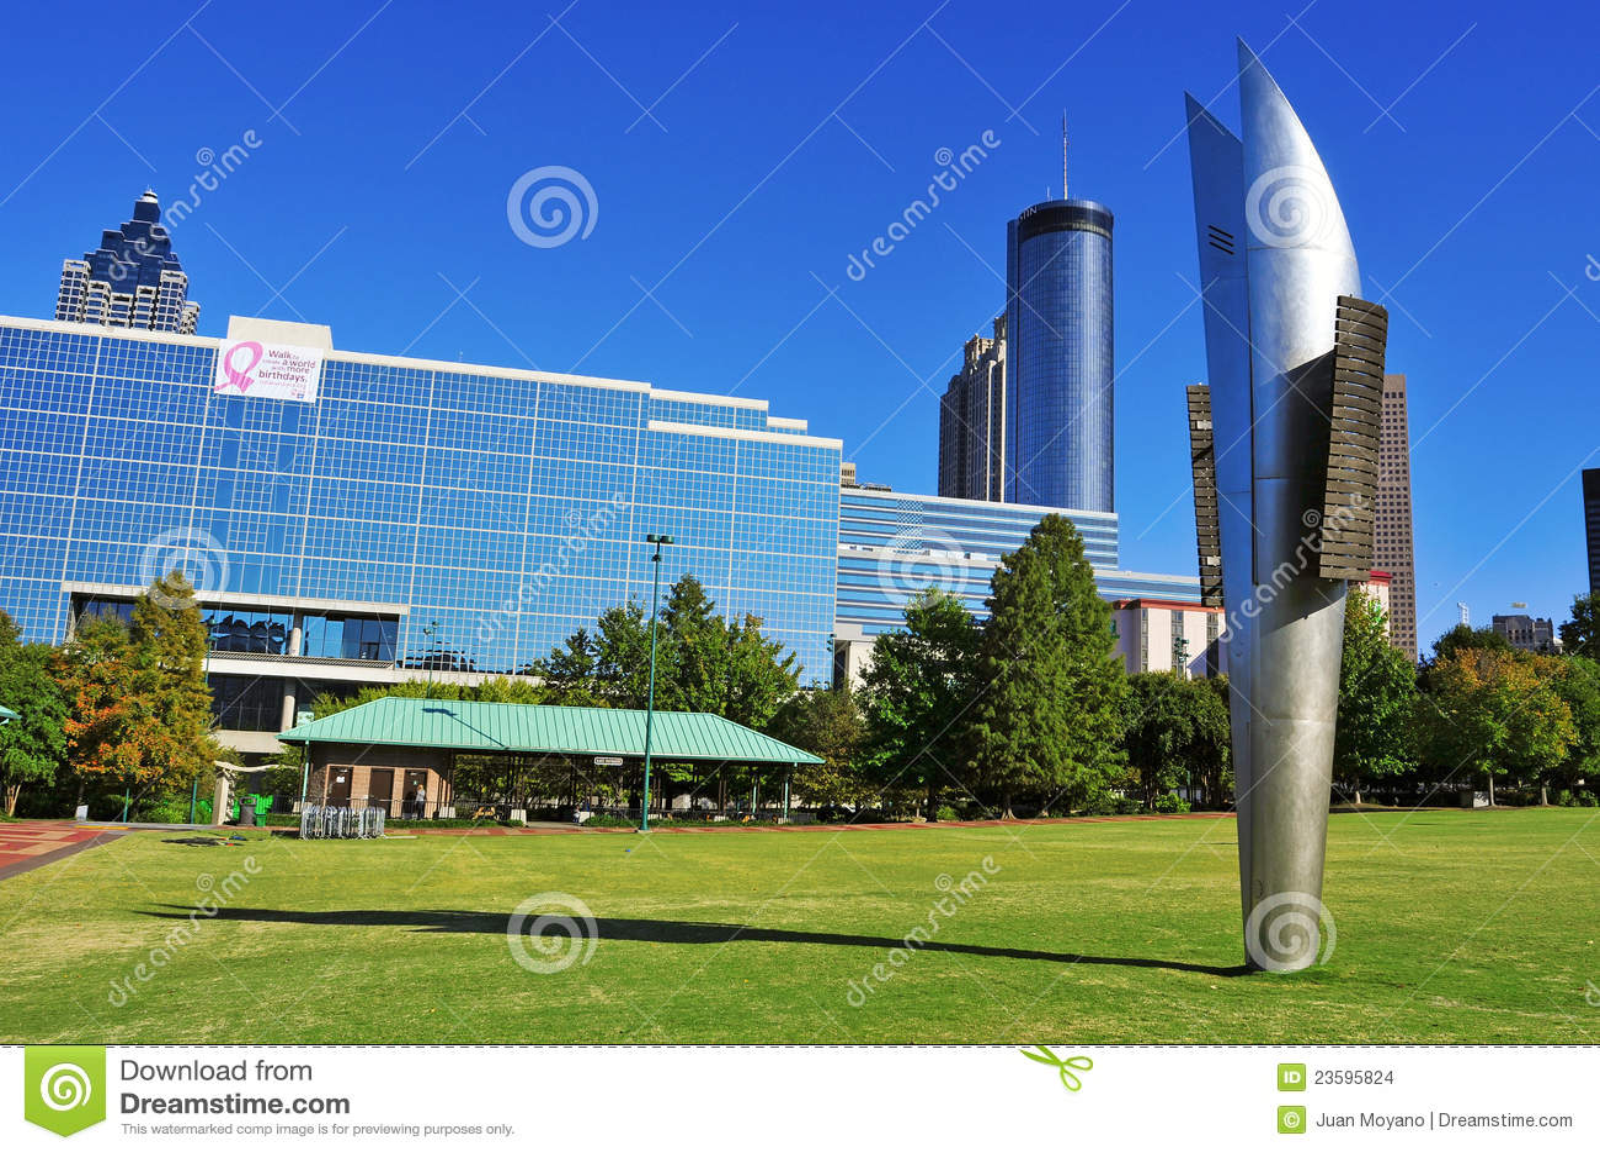 Honderdjarig Olympisch Park, Atlanta, Verenigde Staten